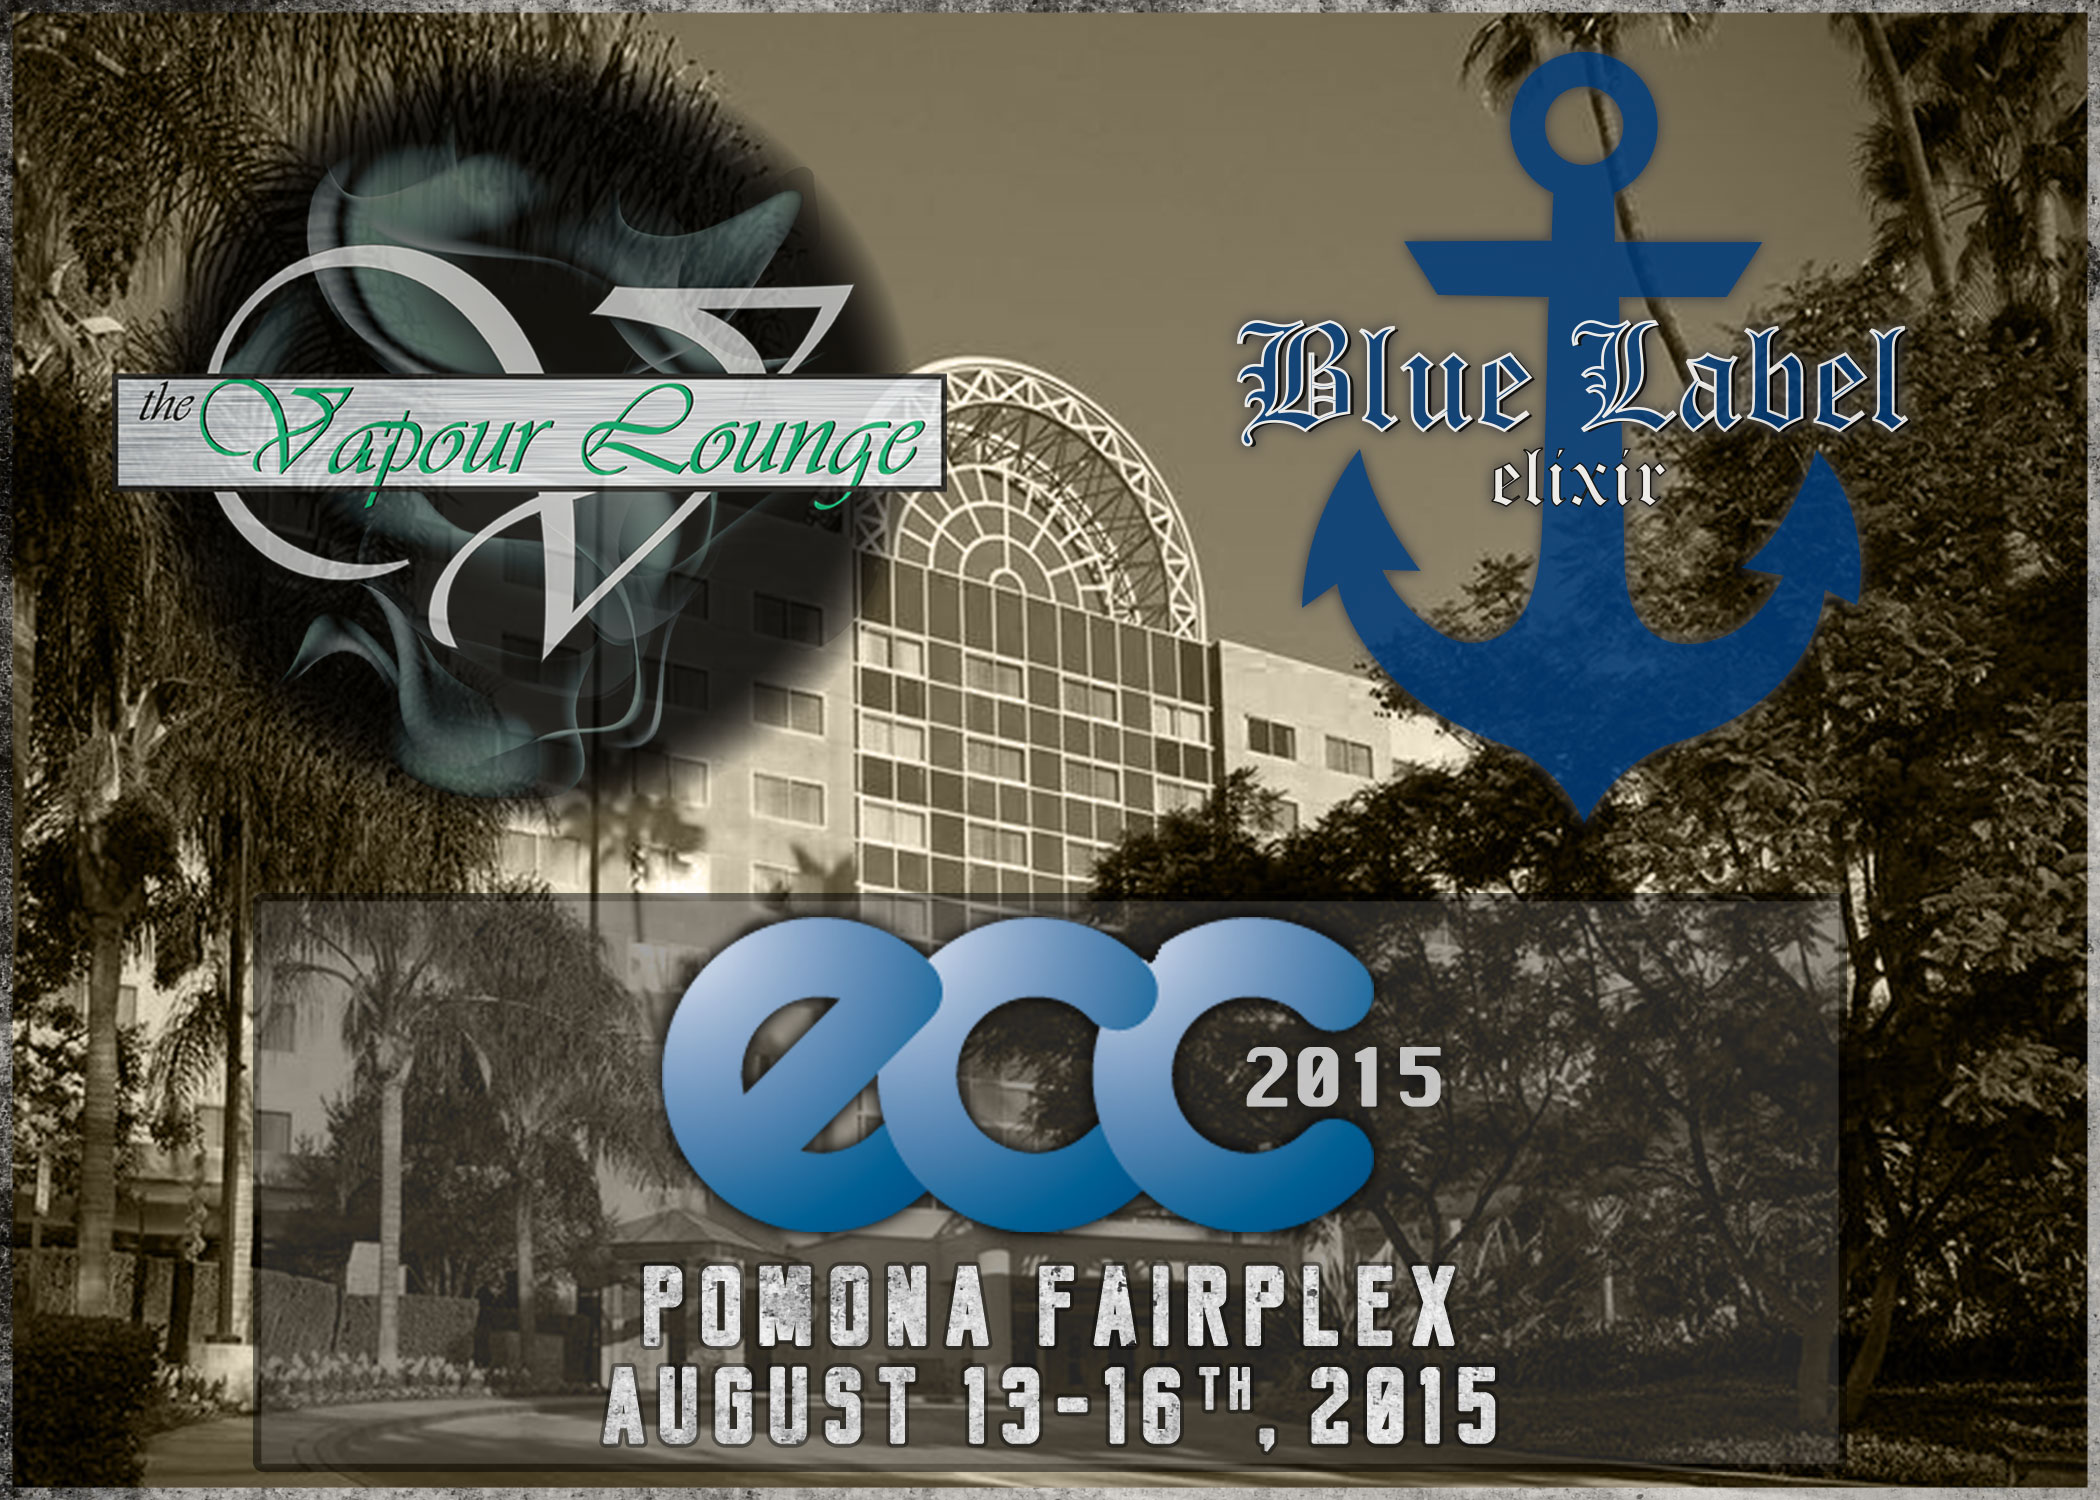 TVL_BlueLabel_ECC2015